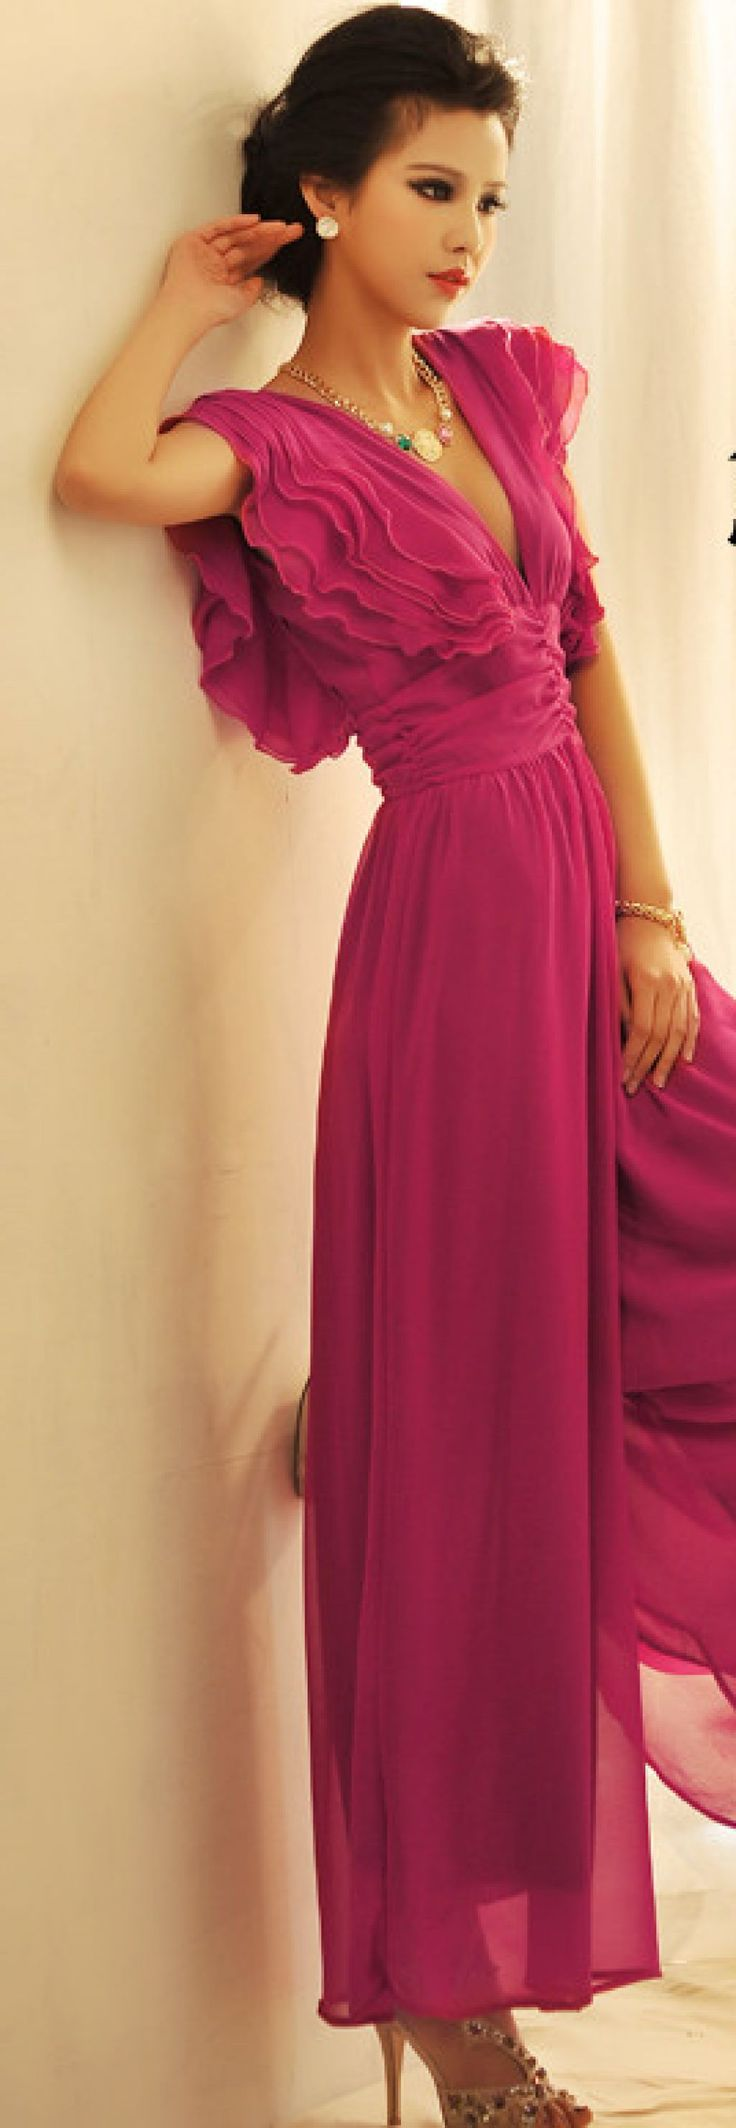 Best 25+ Formal jumpsuit ideas on Pinterest | Elegant ...